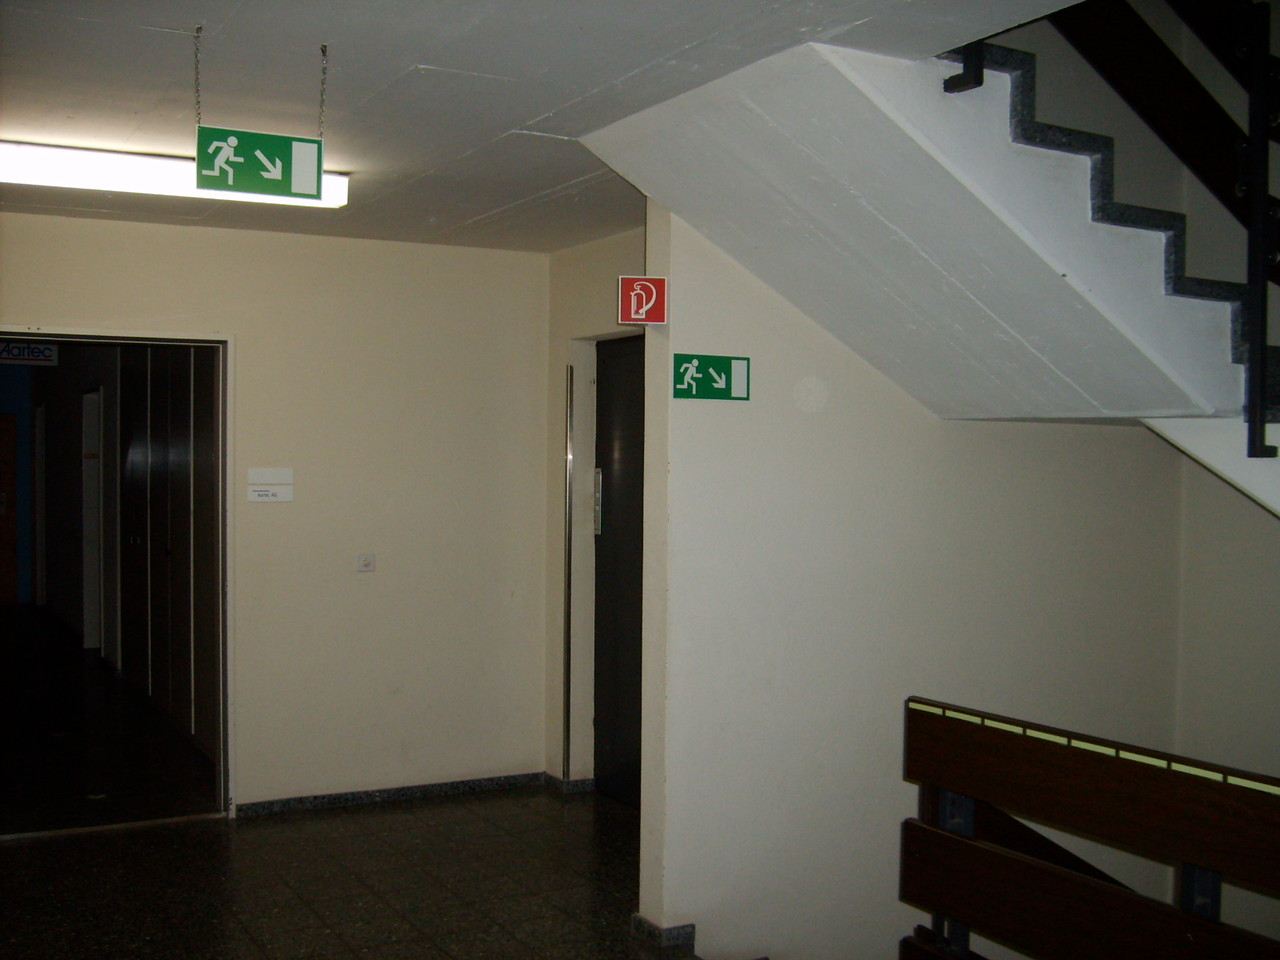 Fluchtweg - rechts/nach unten